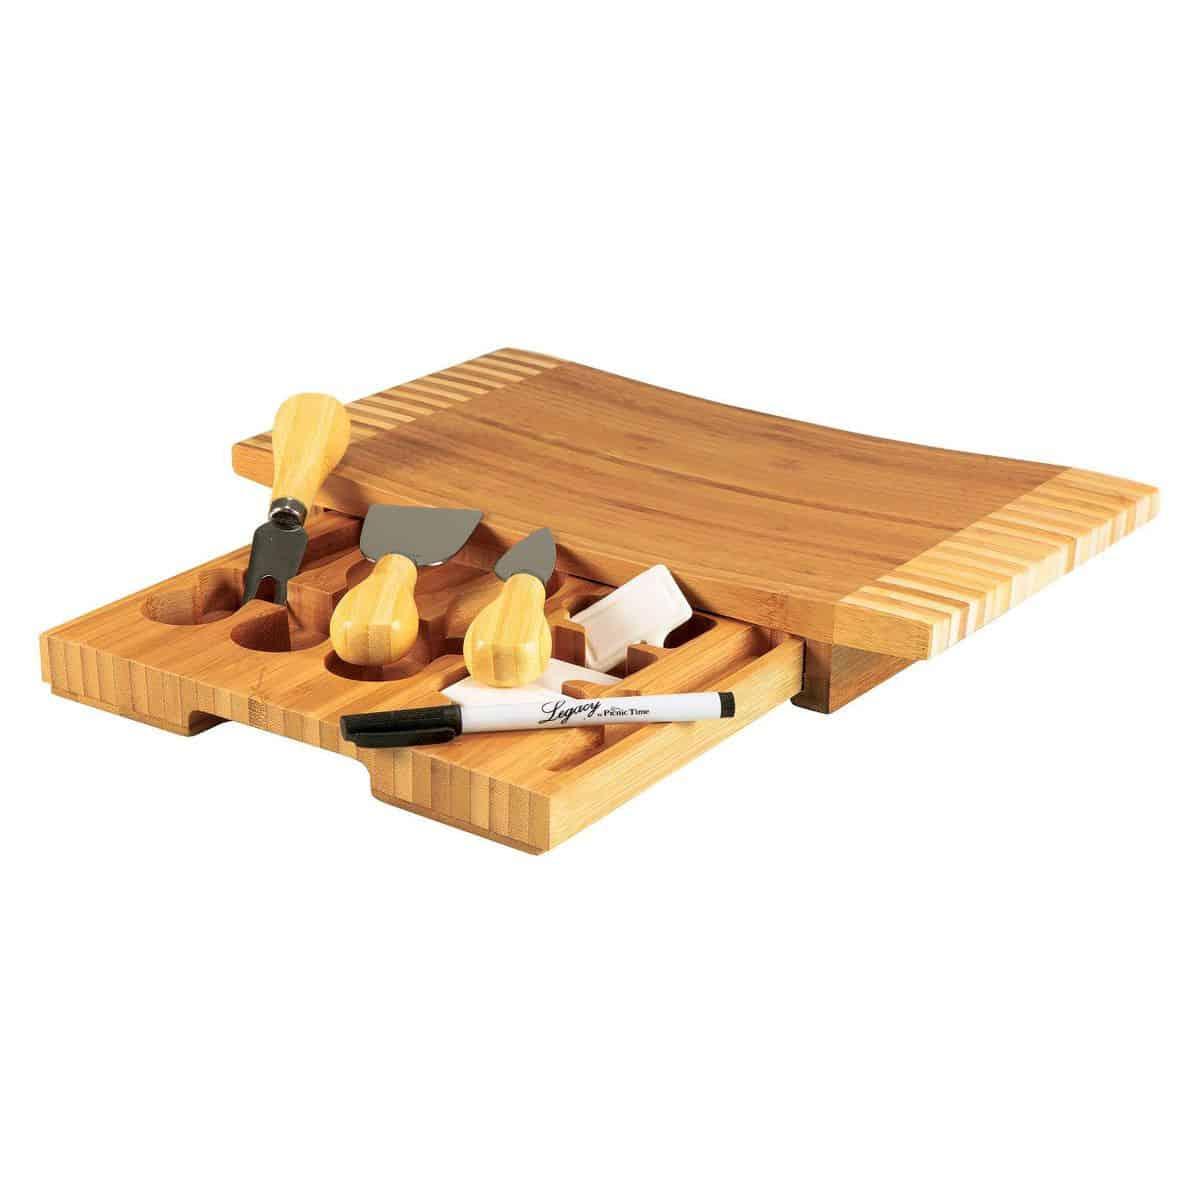 Cheese Board Cutlery Set